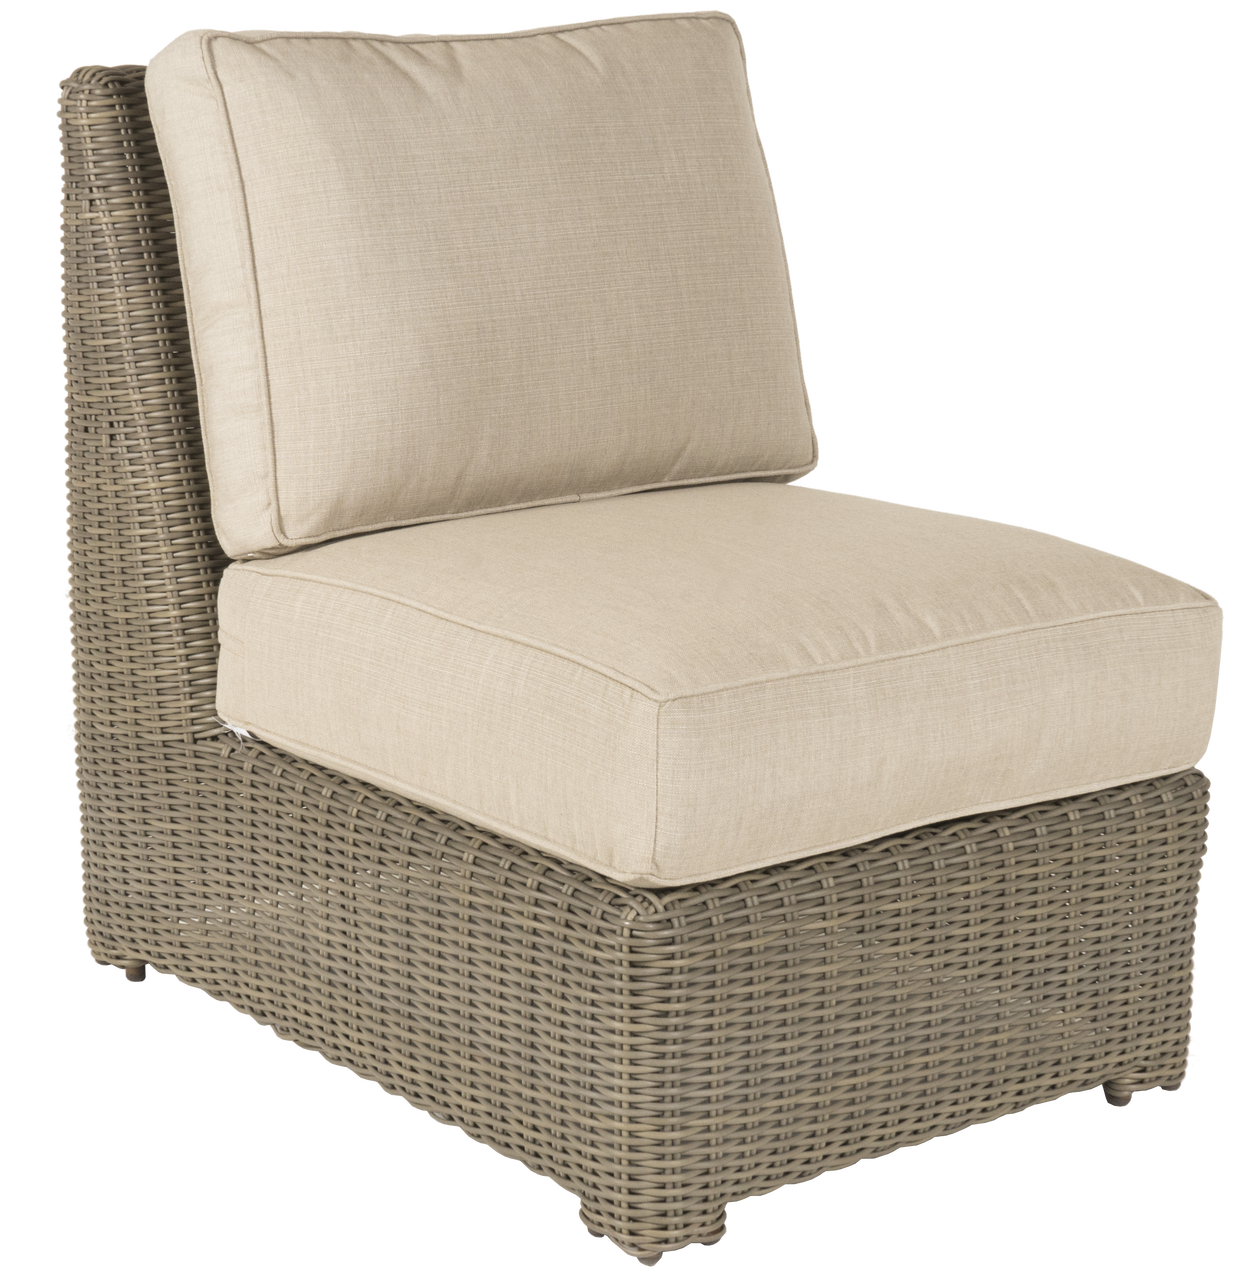 Erwin Napa Outdoor Armless Chair W/Cushion (Ships In 4 6 Weeks)